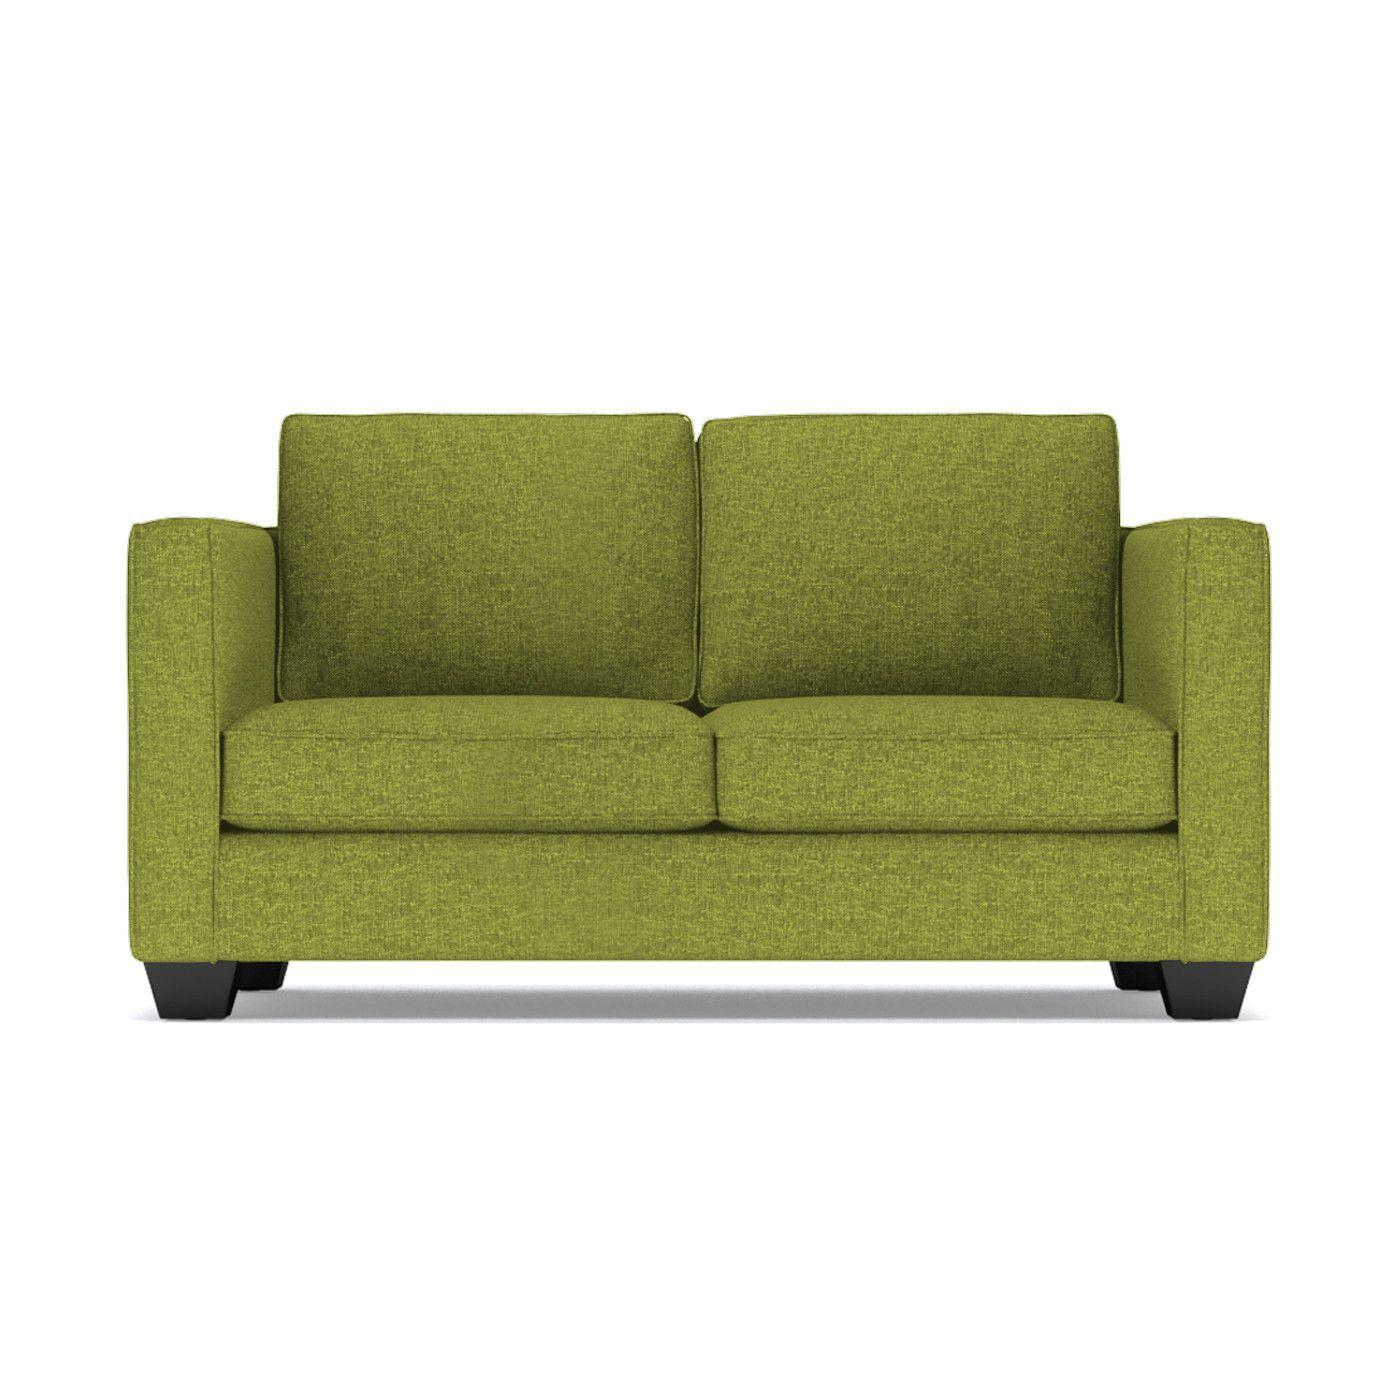 Catalina apartment size sofa choice of fabrics u aptb garden